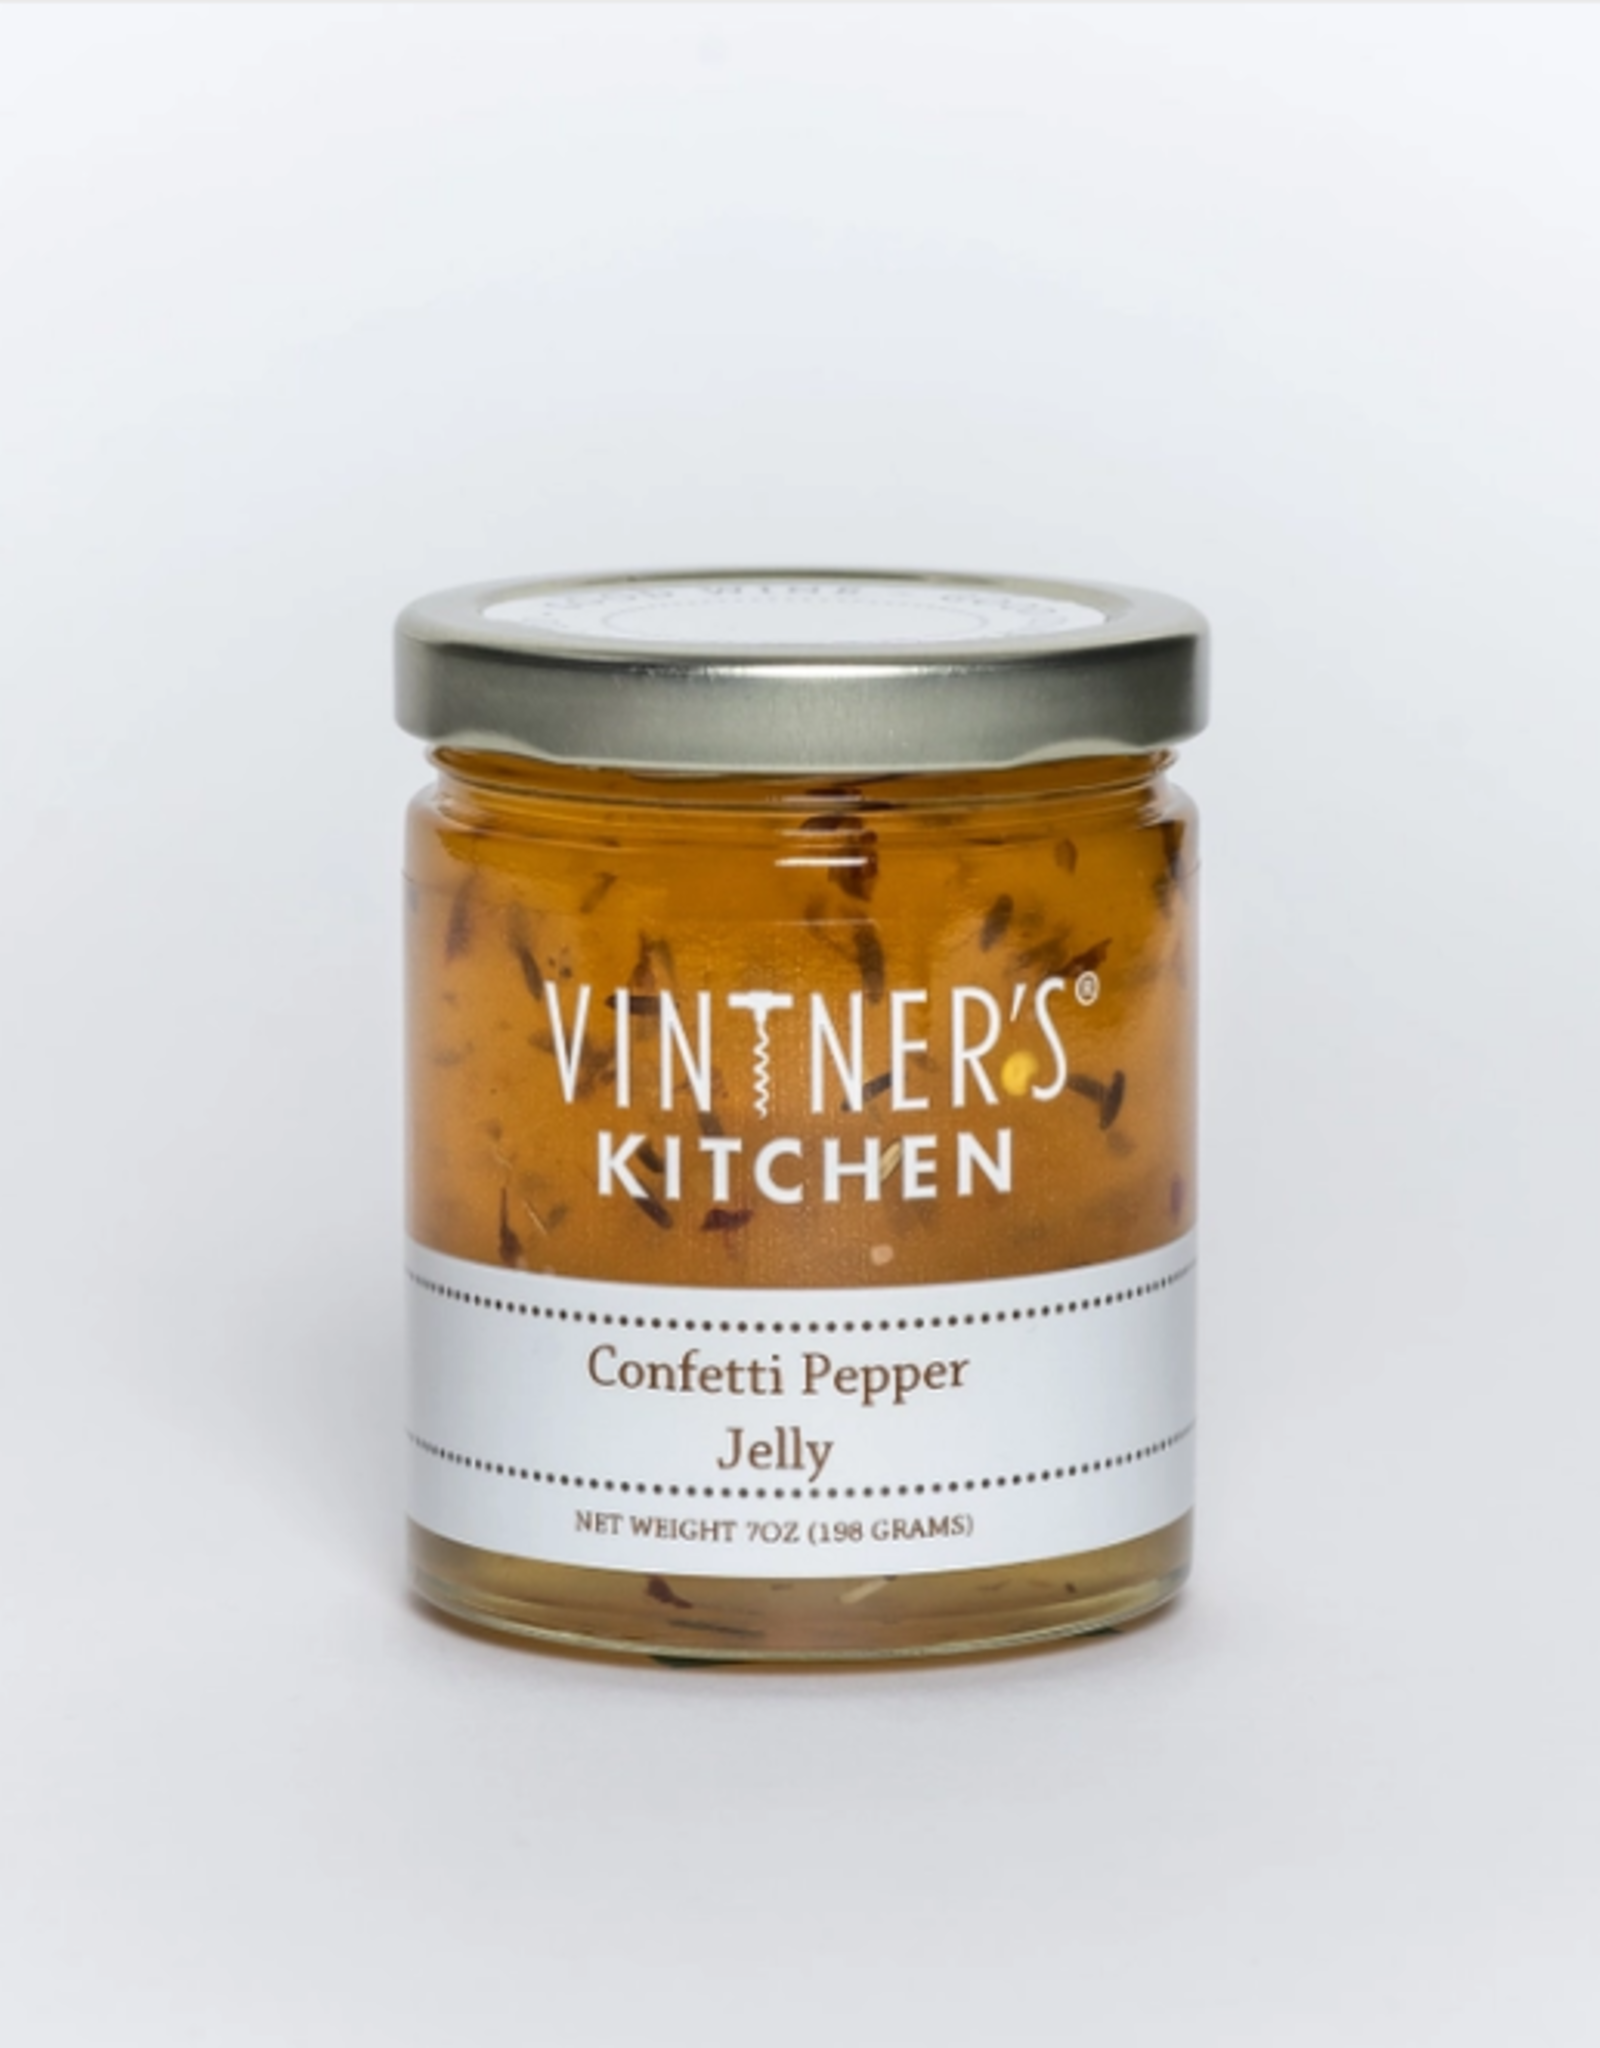 Vintner's Kitchen Confetti Pepper Jelly